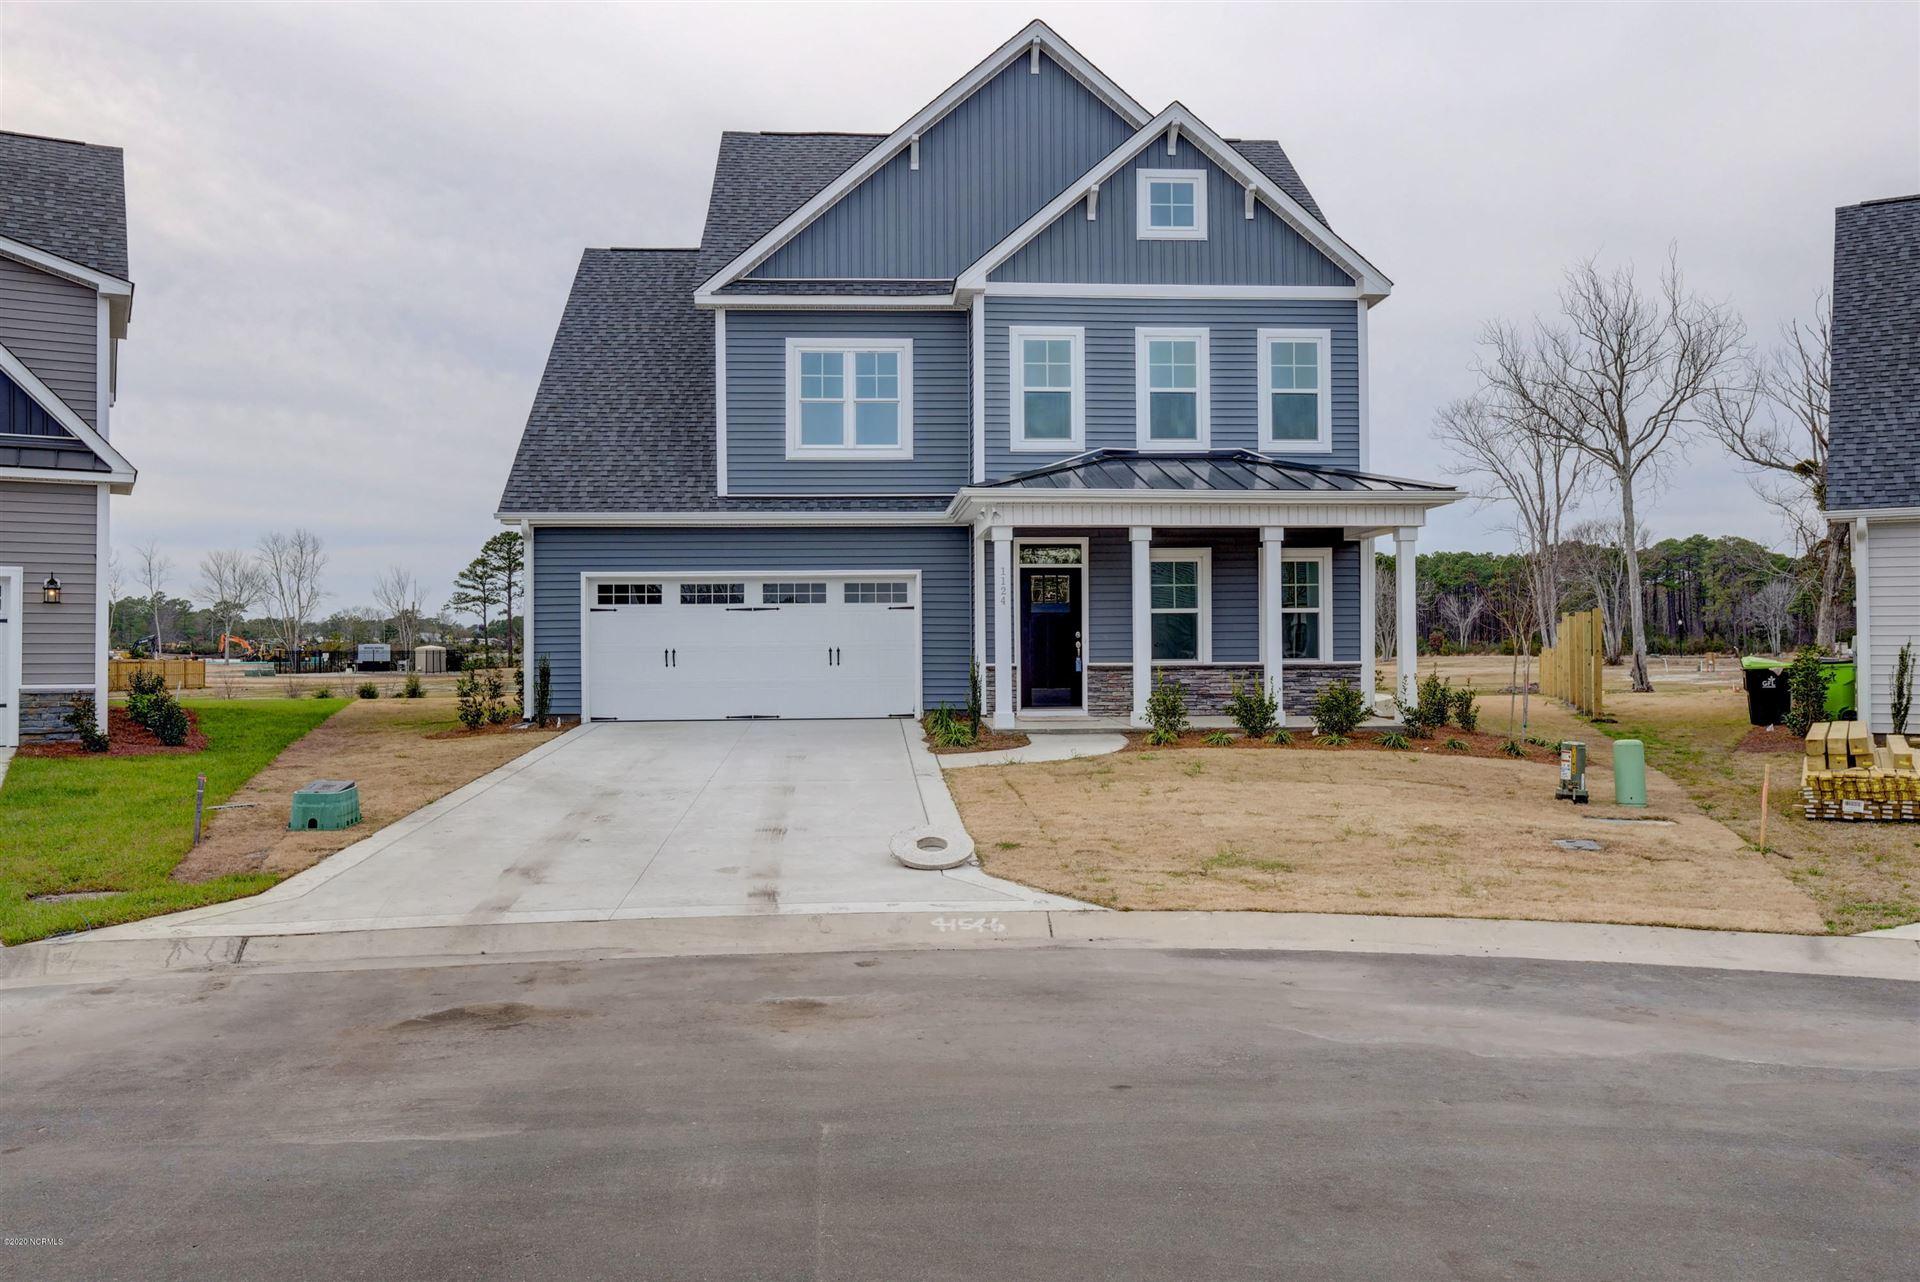 Photo of 6005 Ironwood Drive, Wilmington, NC 28409 (MLS # 100247751)